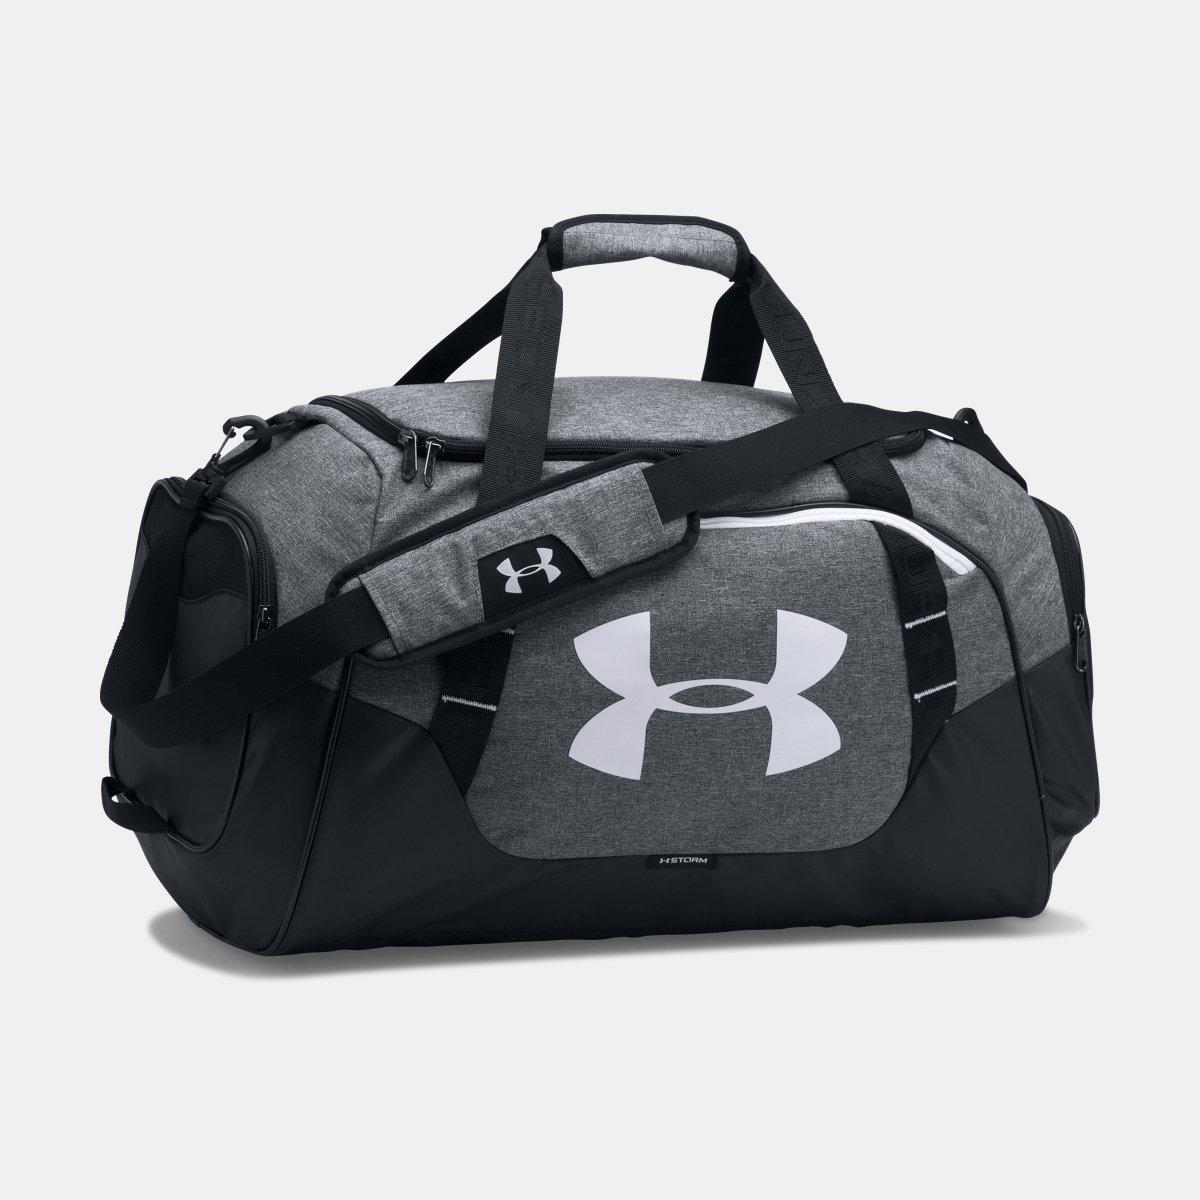 [UNDER ARMOUR] アンダーアーマー Men's UA Undeniable 3.0 Medium Duffle Bag Graphite/Black [並行輸入品] B07539YMCH